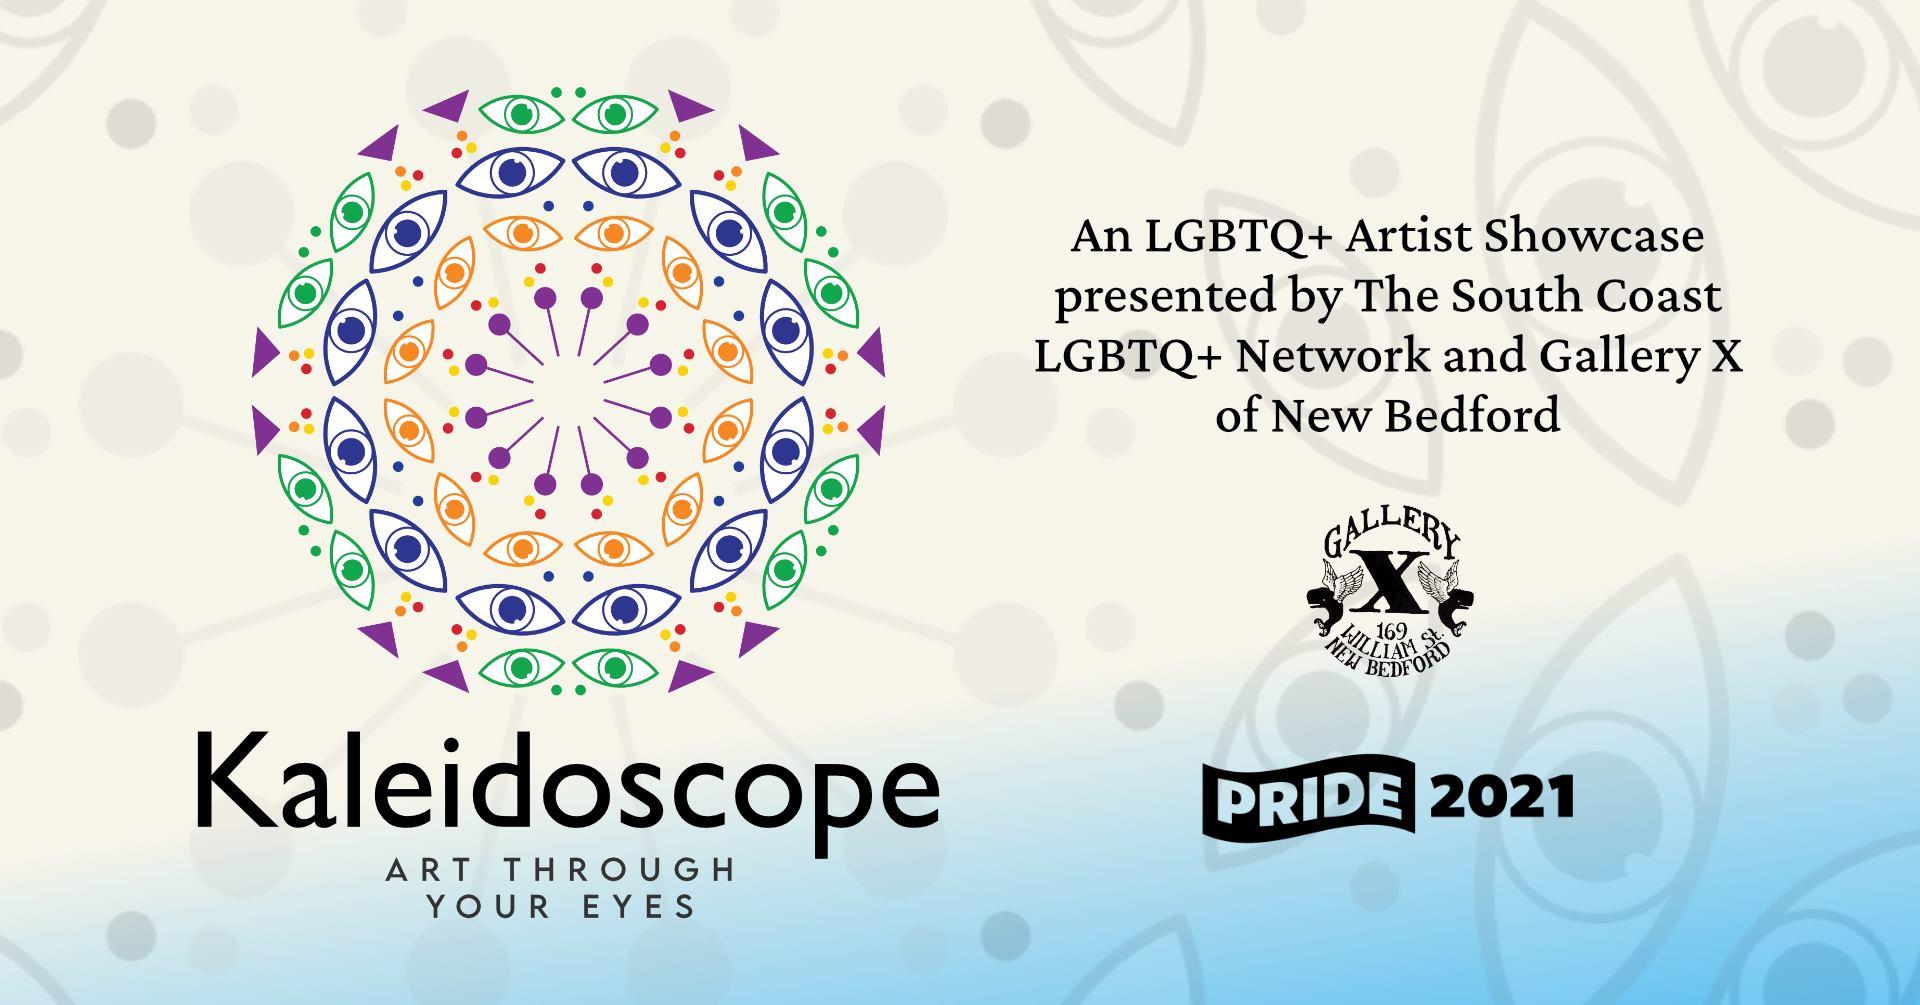 Kaleidoscope: Art Through Your Eyes